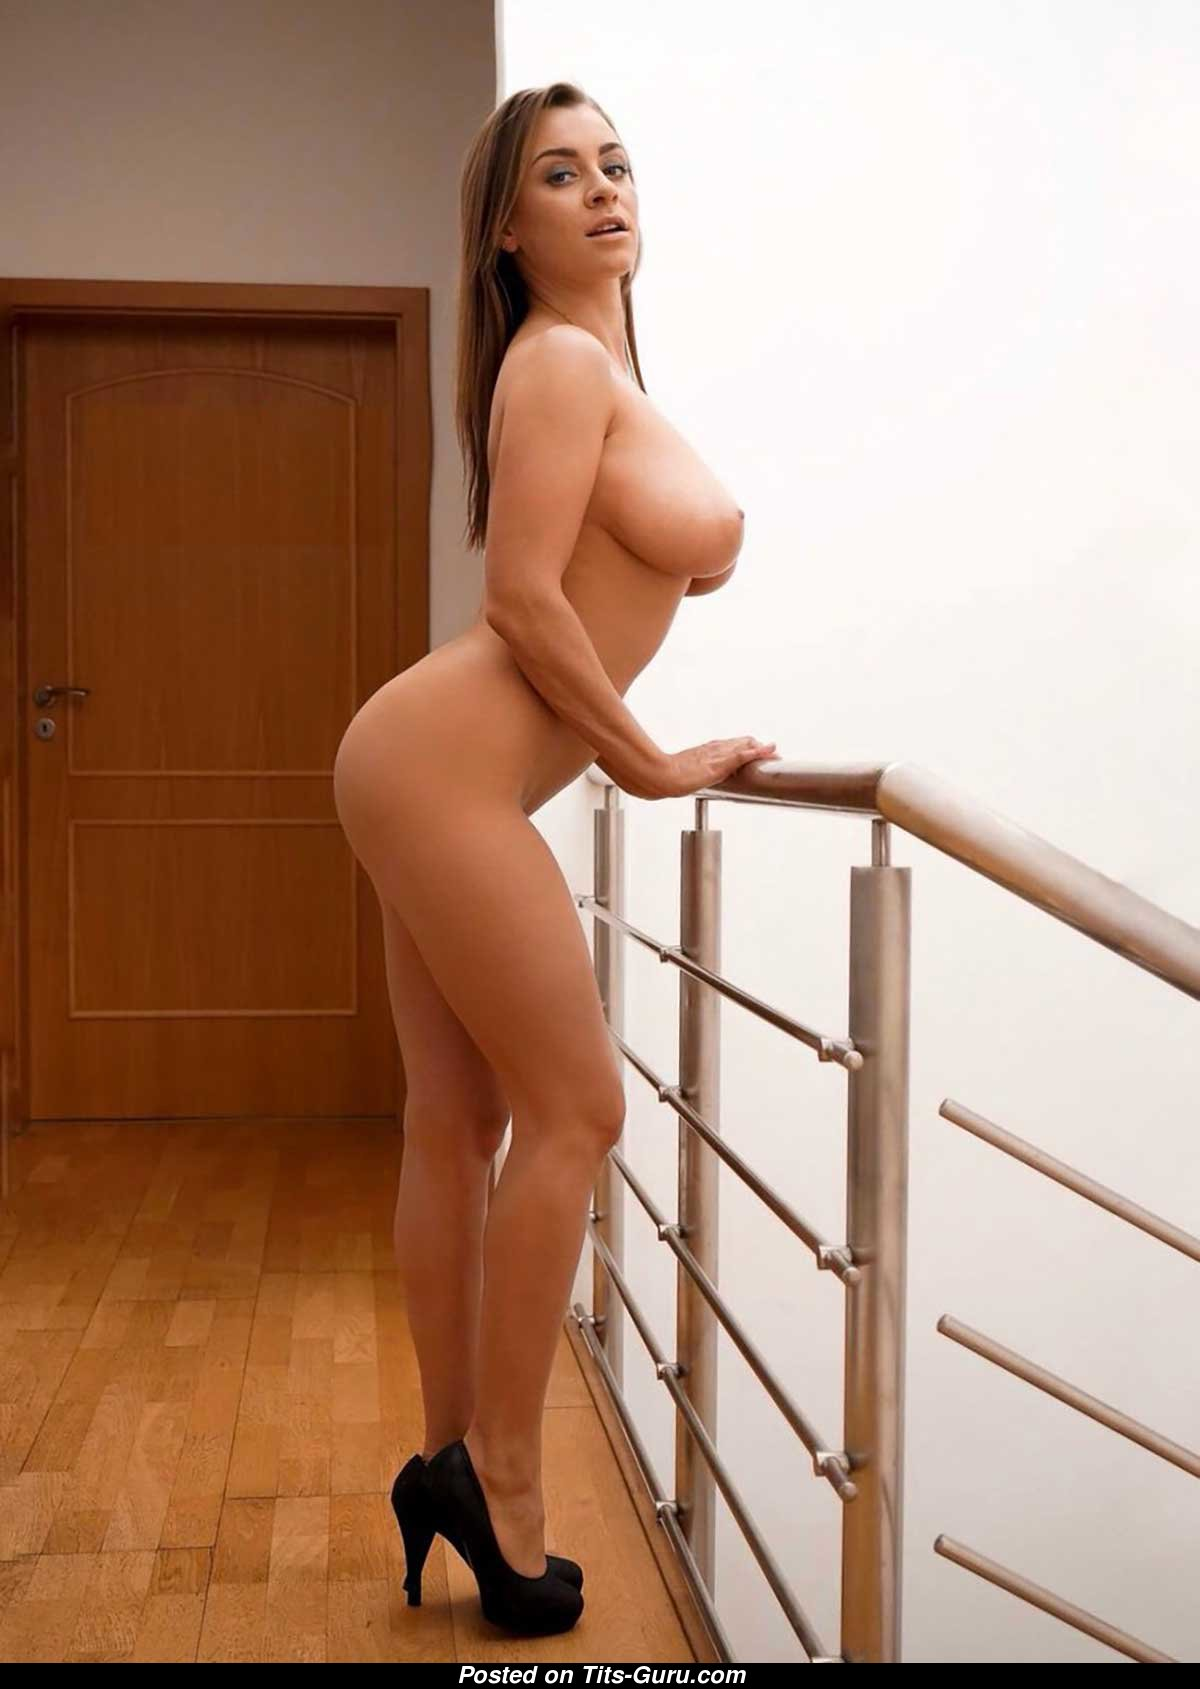 Josephine Jackson - Blonde Babe with Bare Real Medium ...